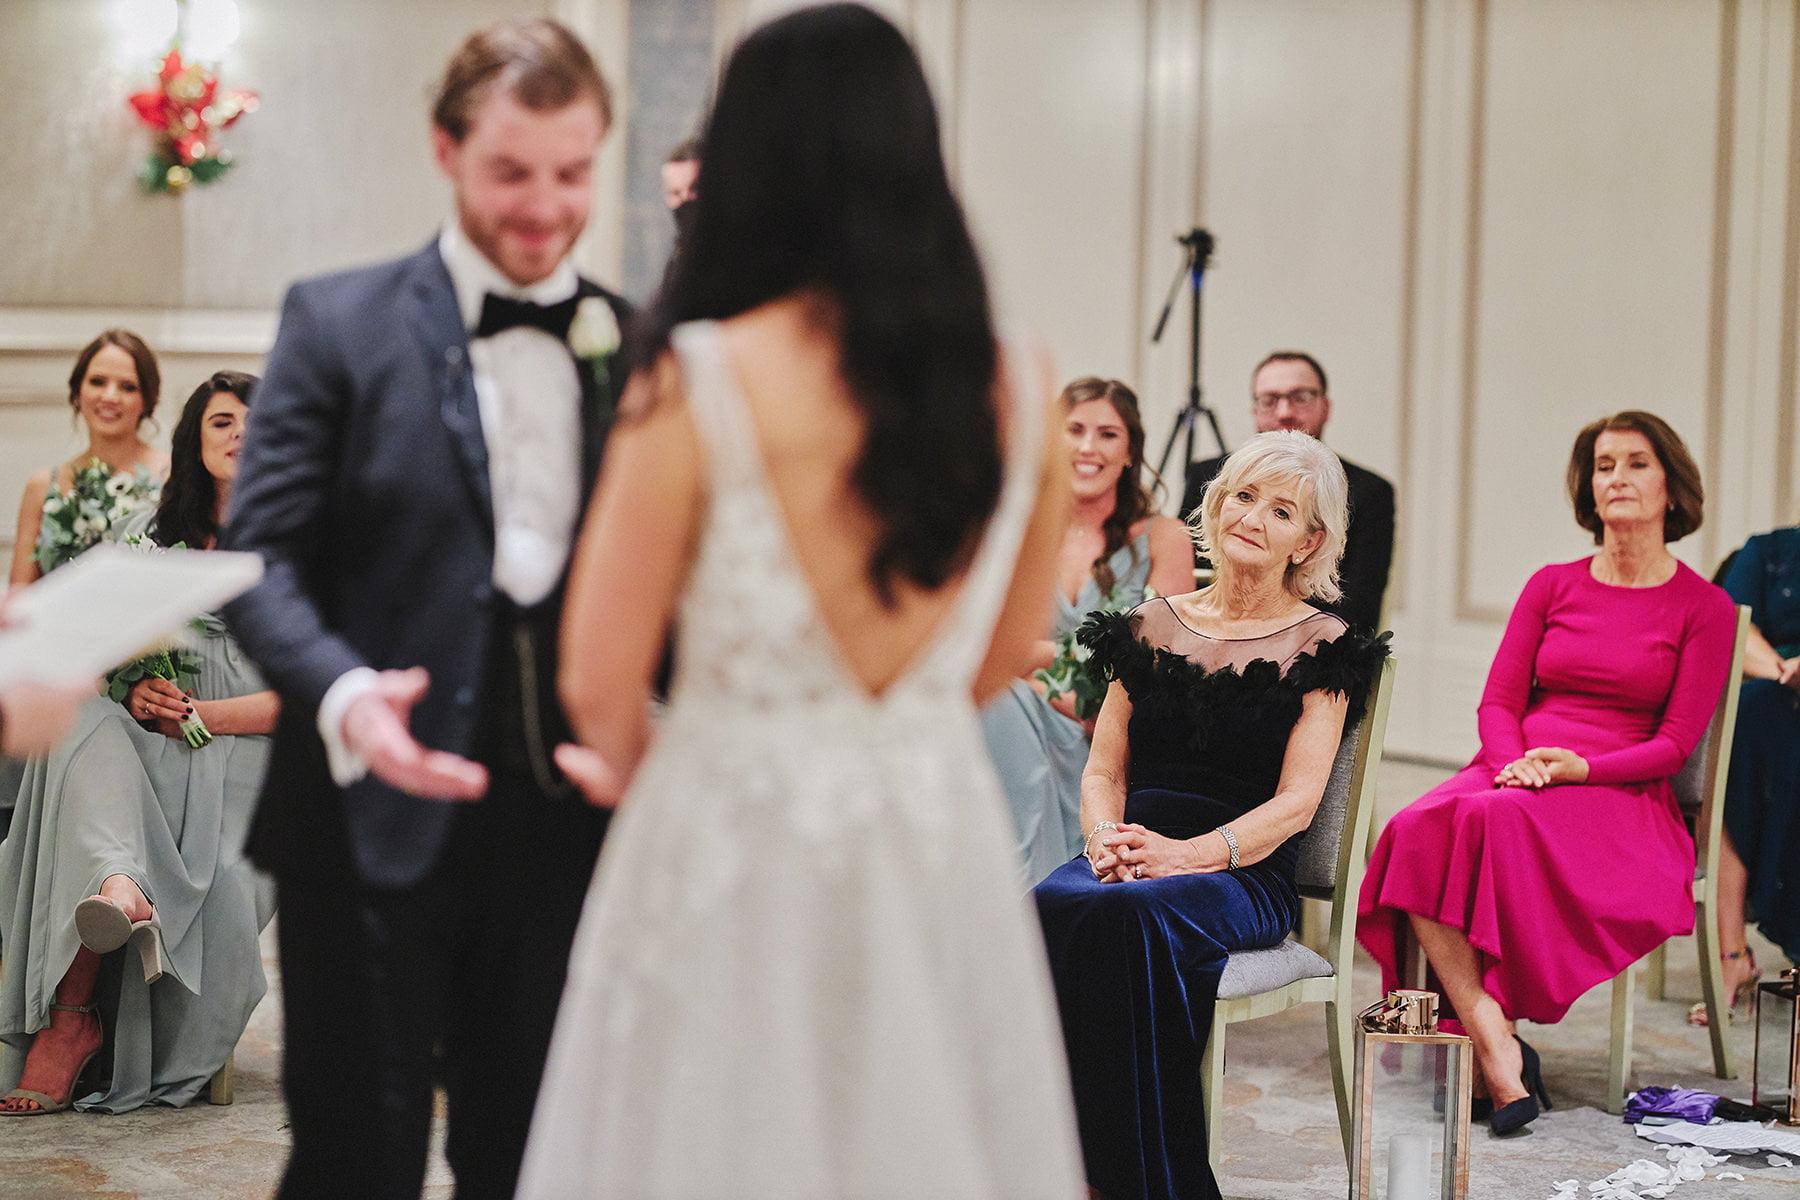 POWERSCOURT HOTEL RESORT INTIMATE WEDDING 52